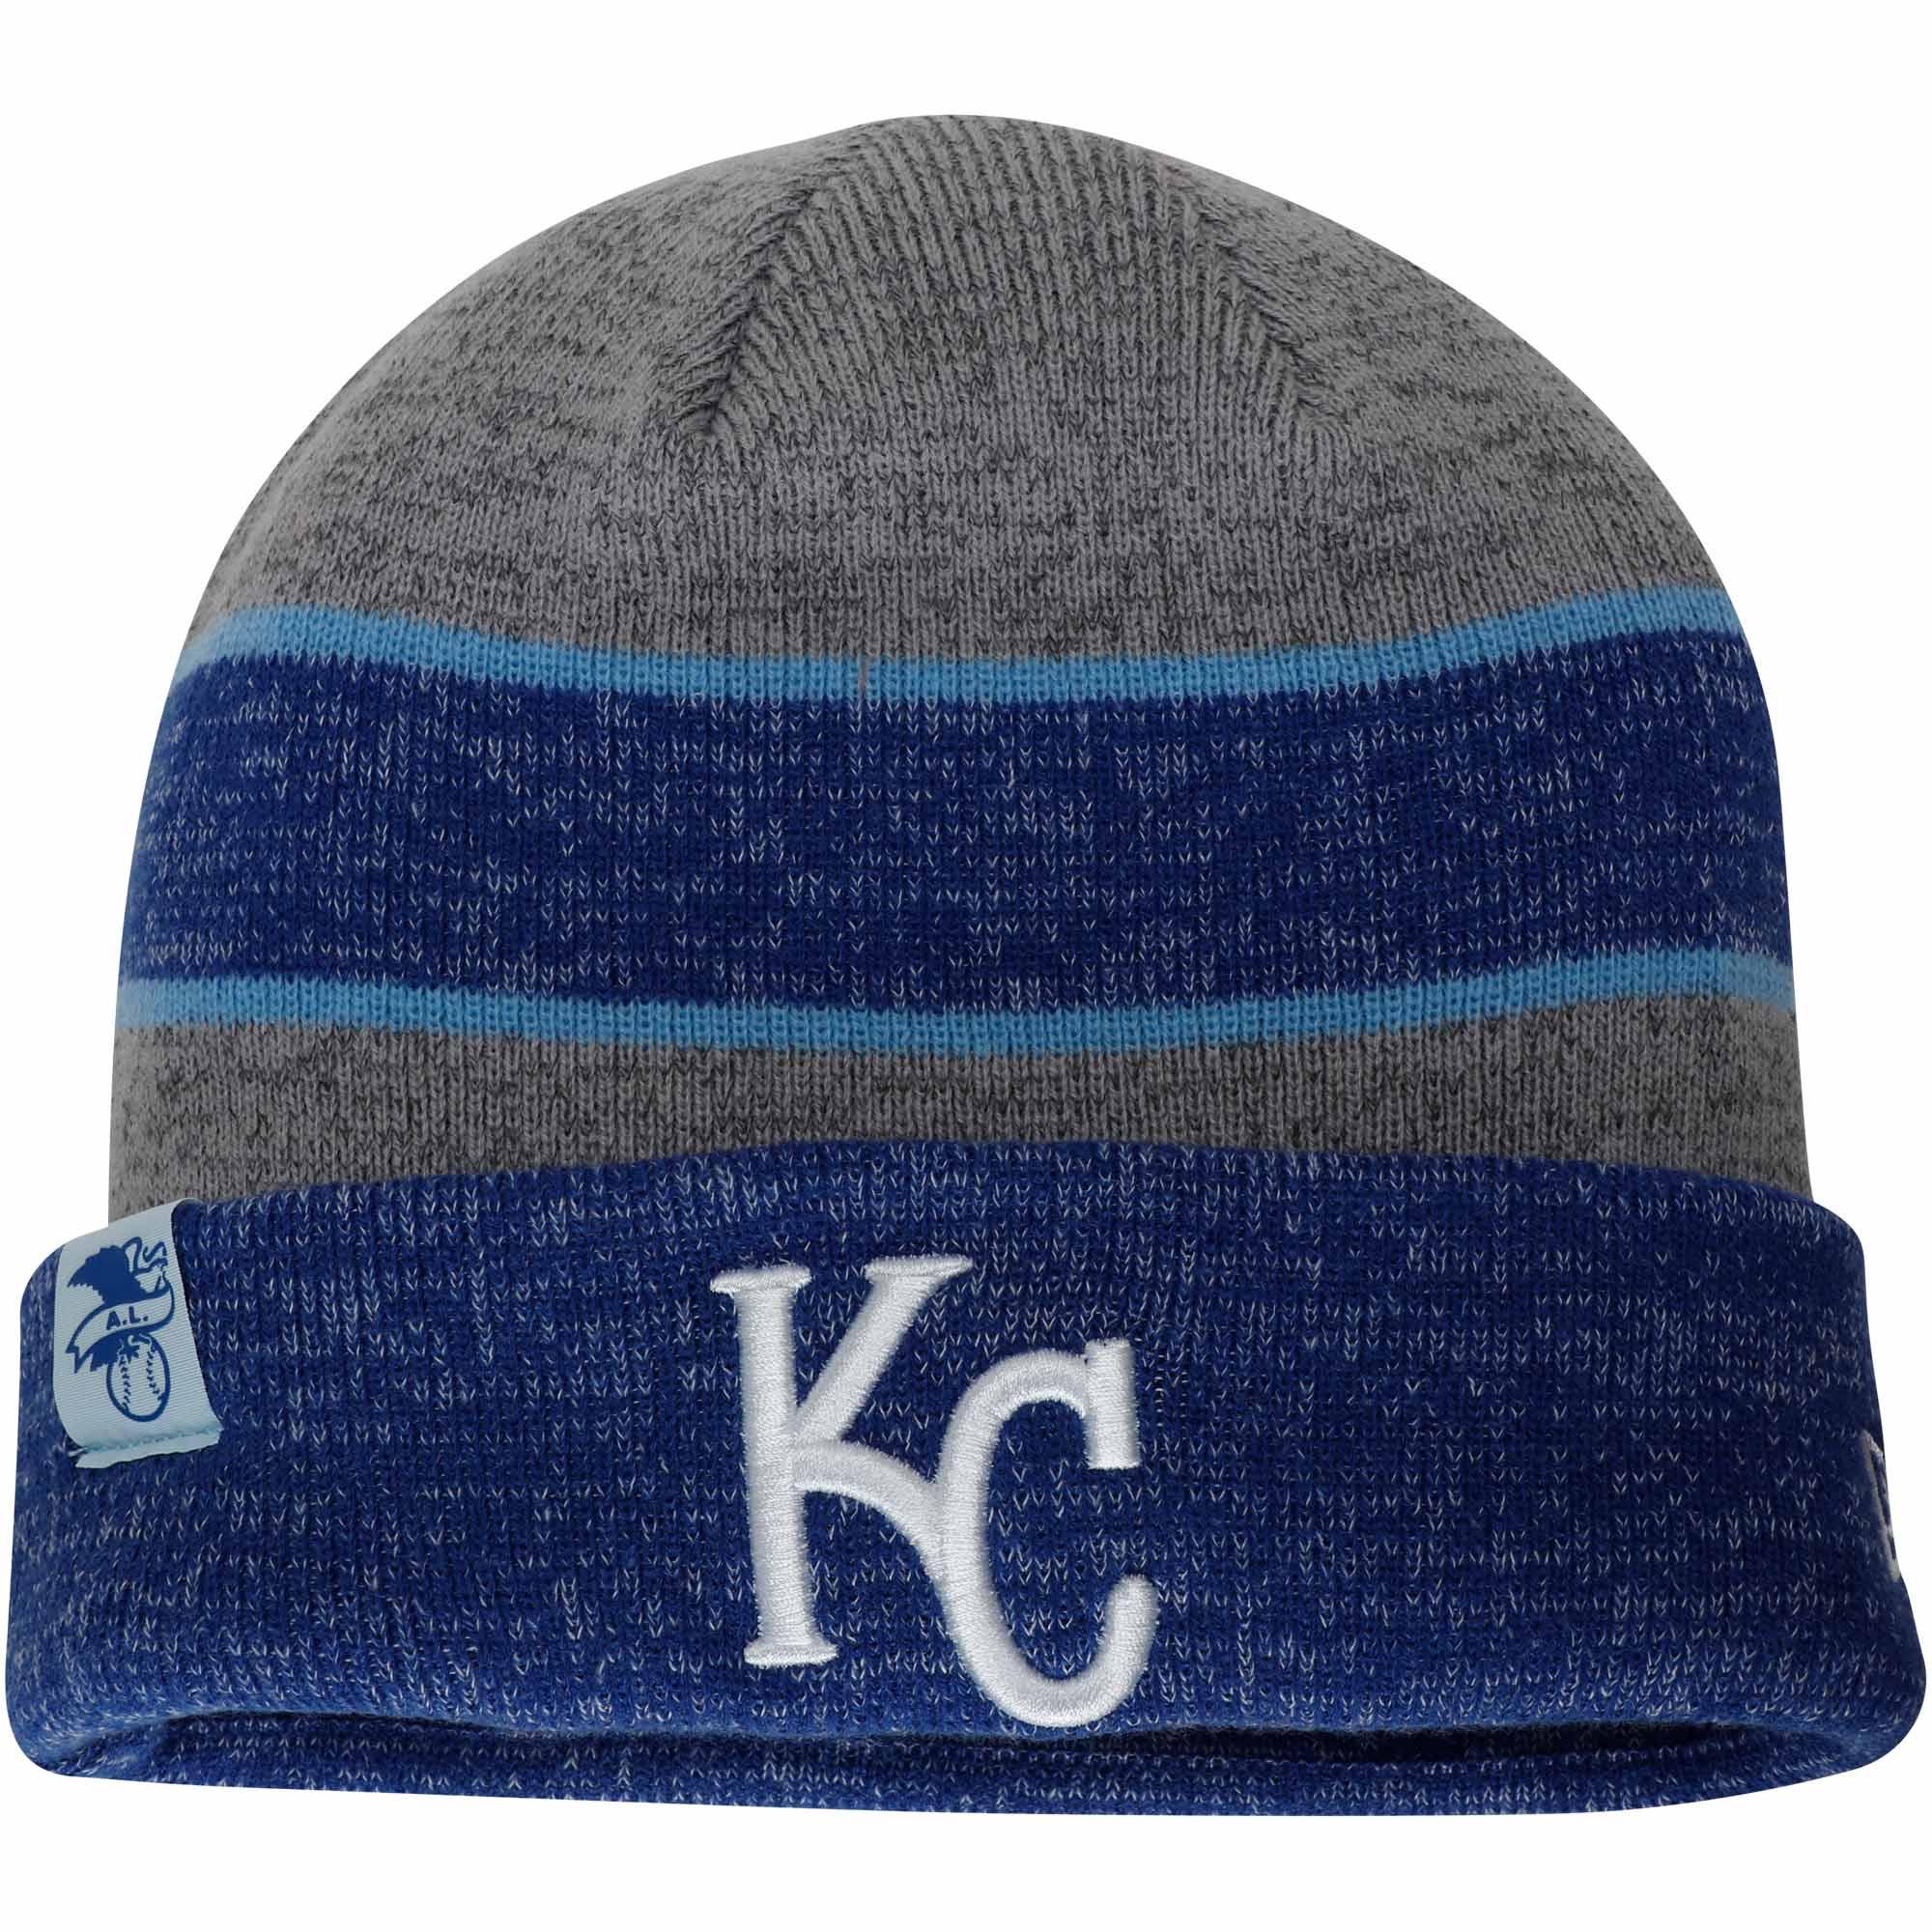 Kansas City Royals New Era On-Field Sport Knit Hat - Heathered Gray/Heathered Royal - OSFA